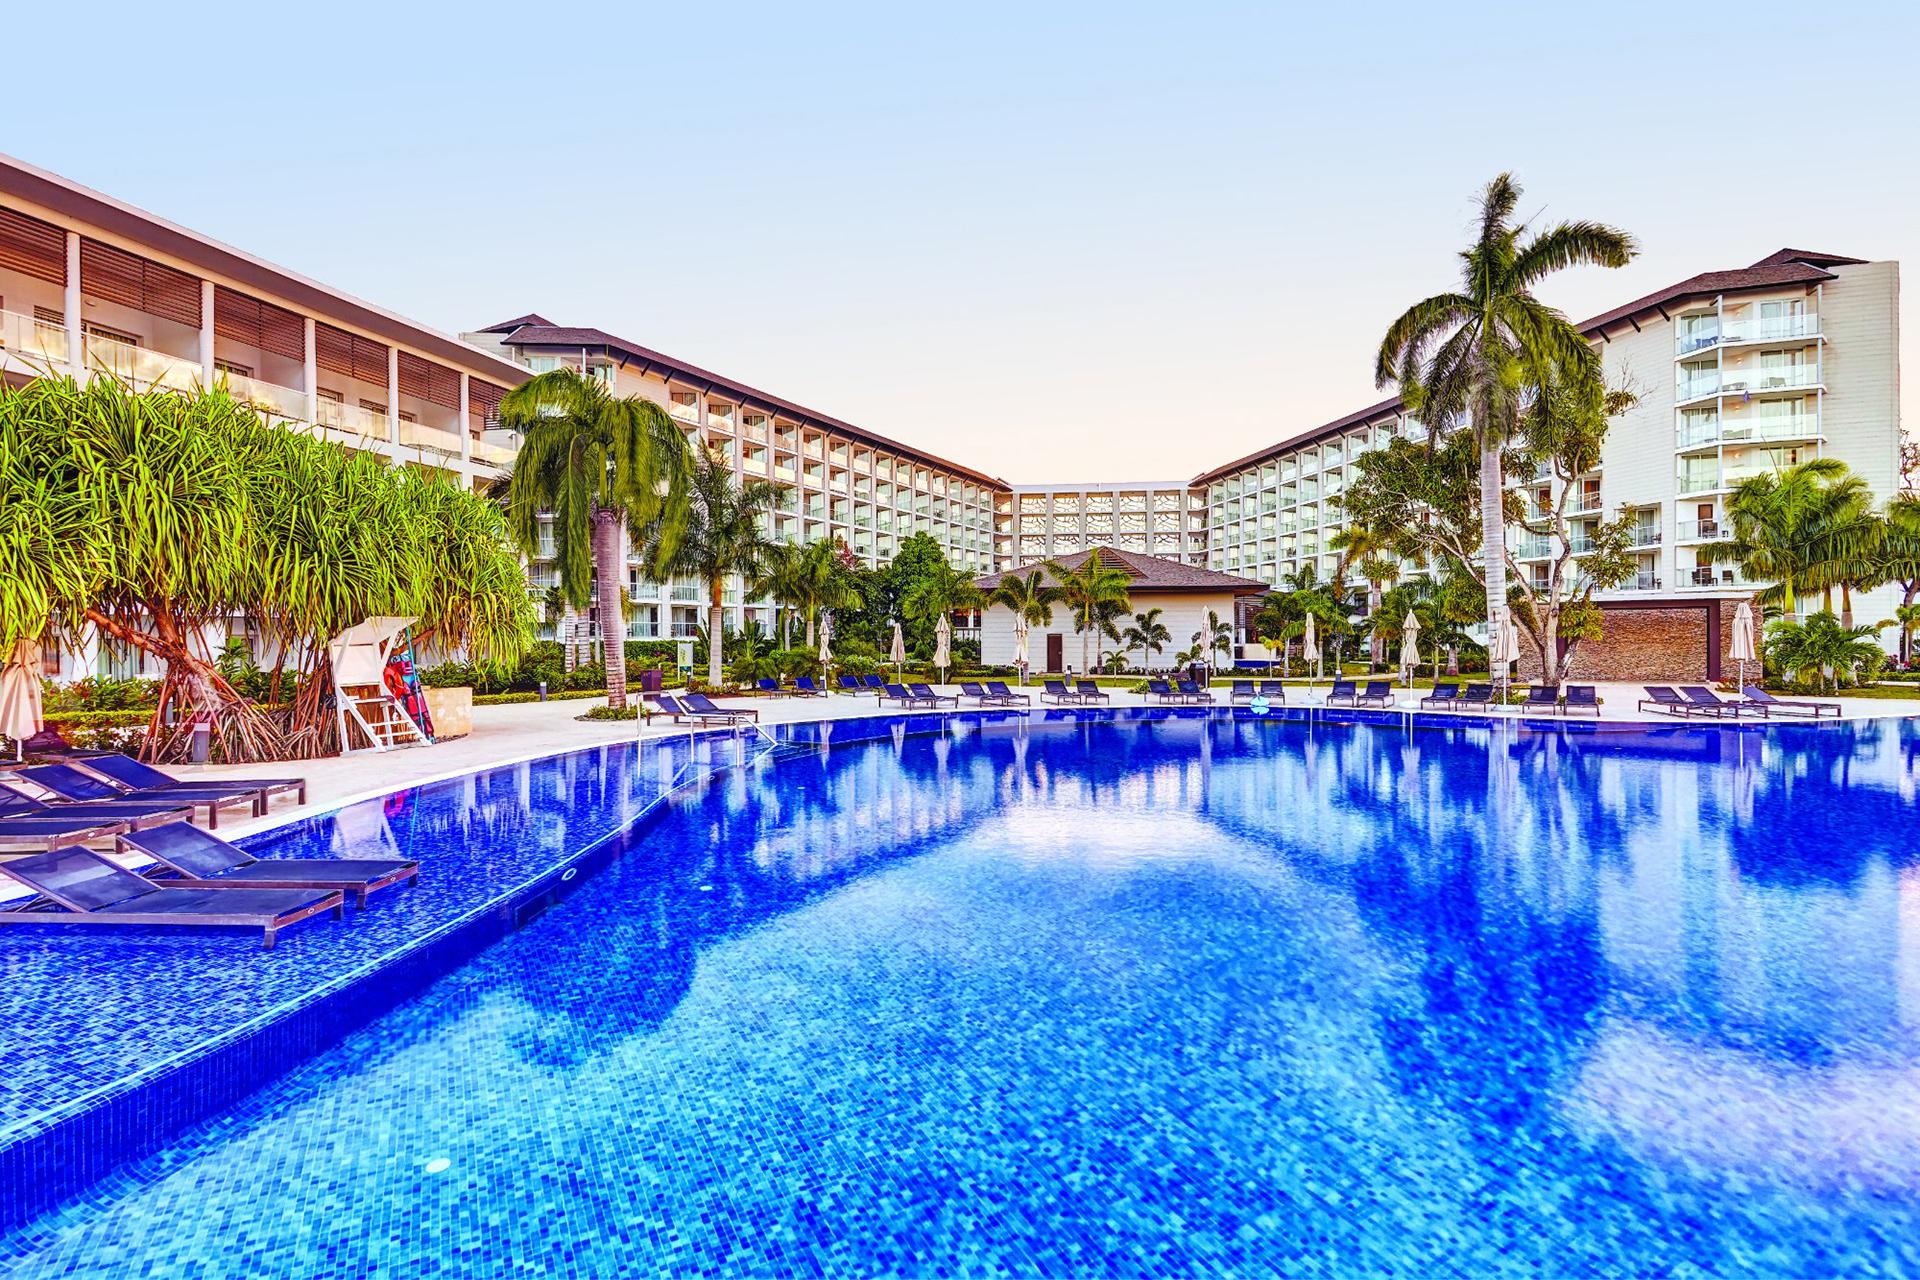 Royalton White Sands Resort; Courtesy of Royalton White Sands Resort